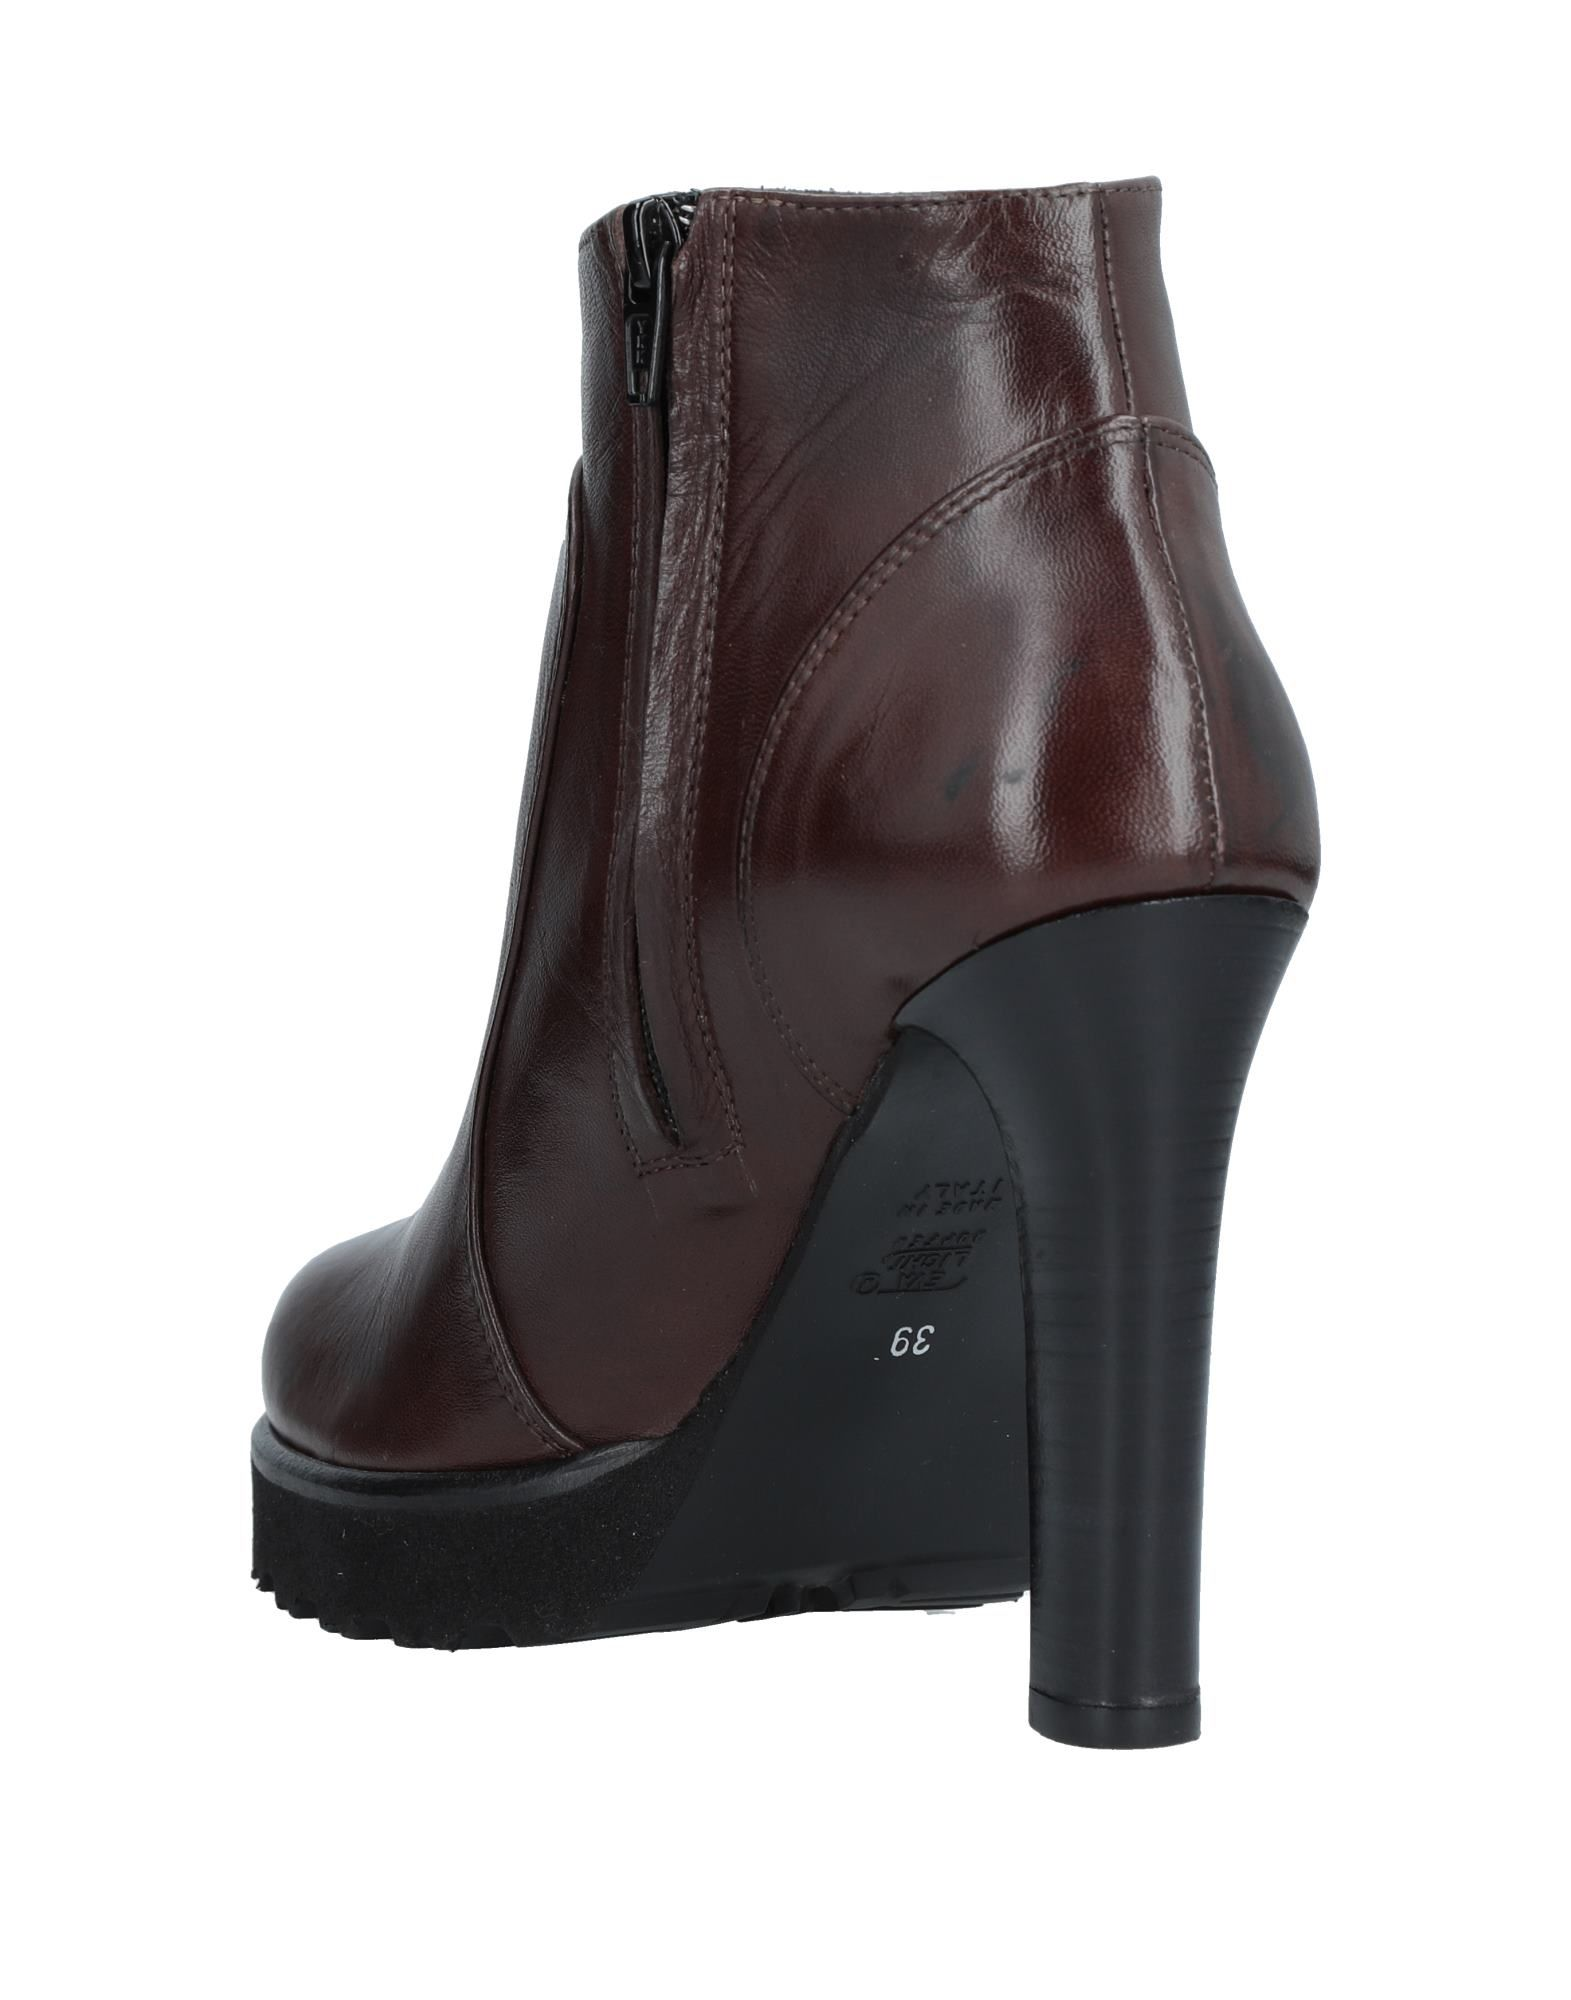 Silvana Stiefelette Damen  Schuhe 11529247RE Gute Qualität beliebte Schuhe  1d32dc